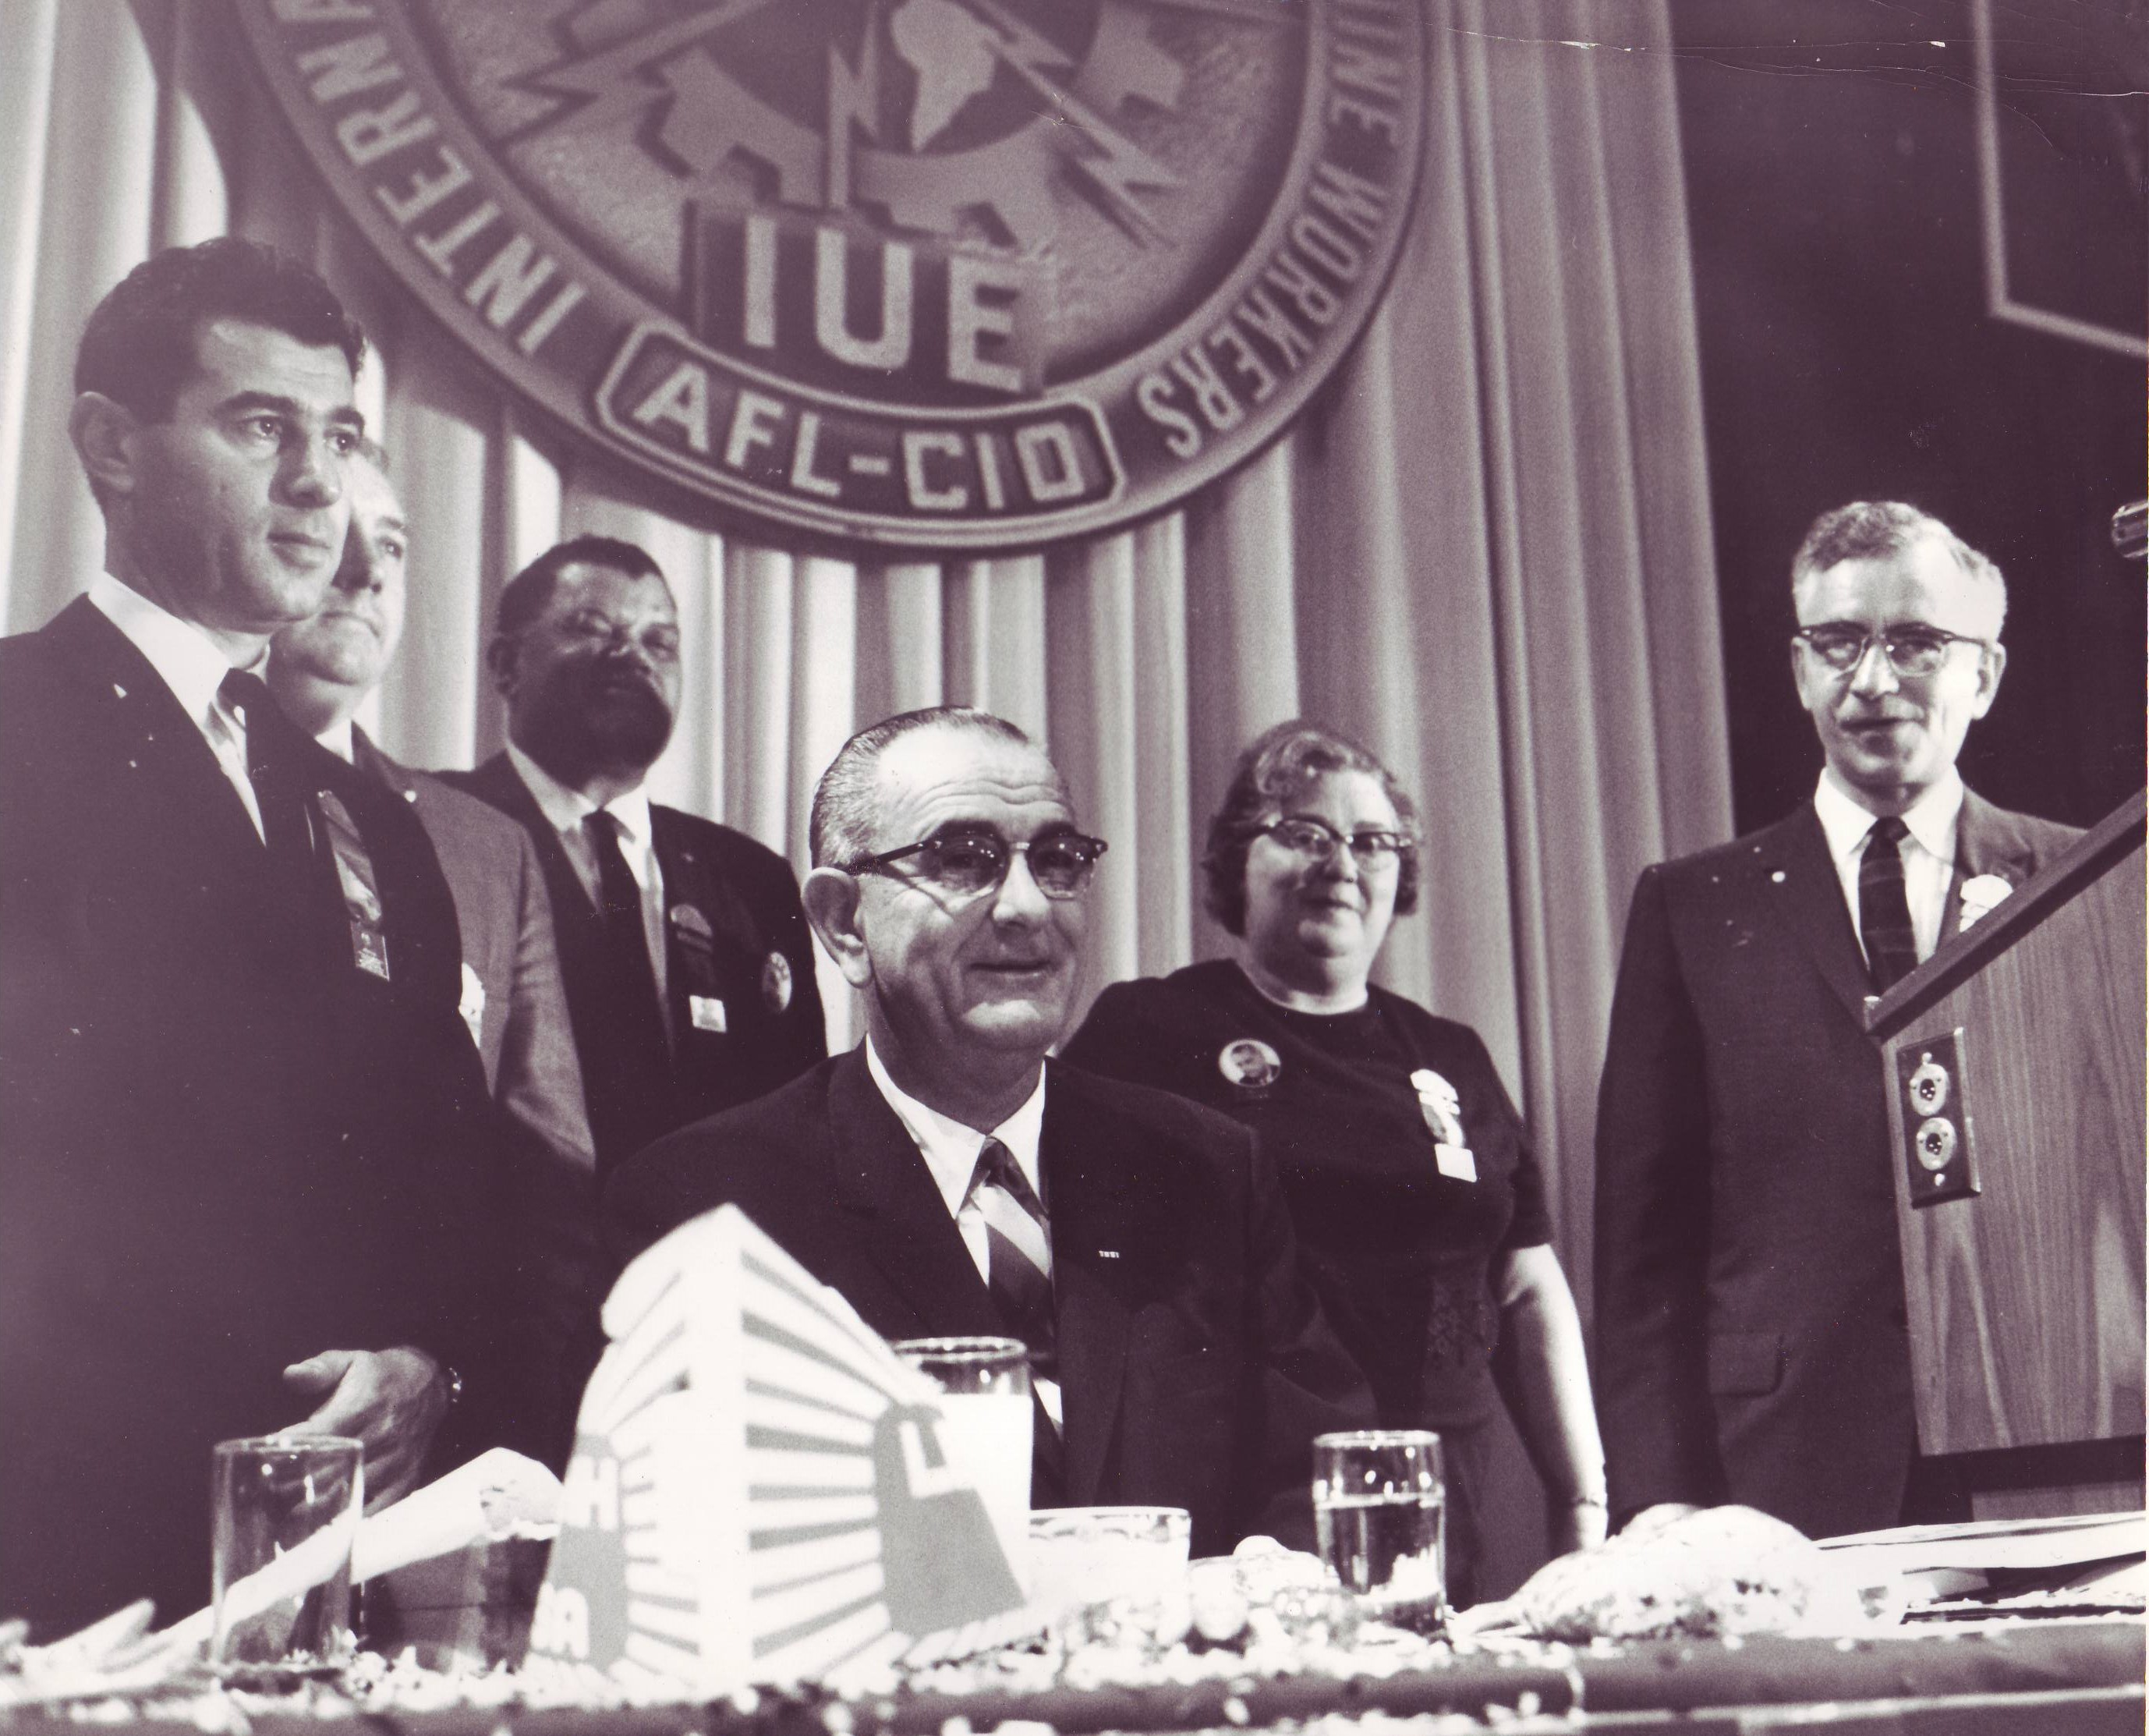 Rabbi Richard Hirsch and President Johnson at AFL-CIO event